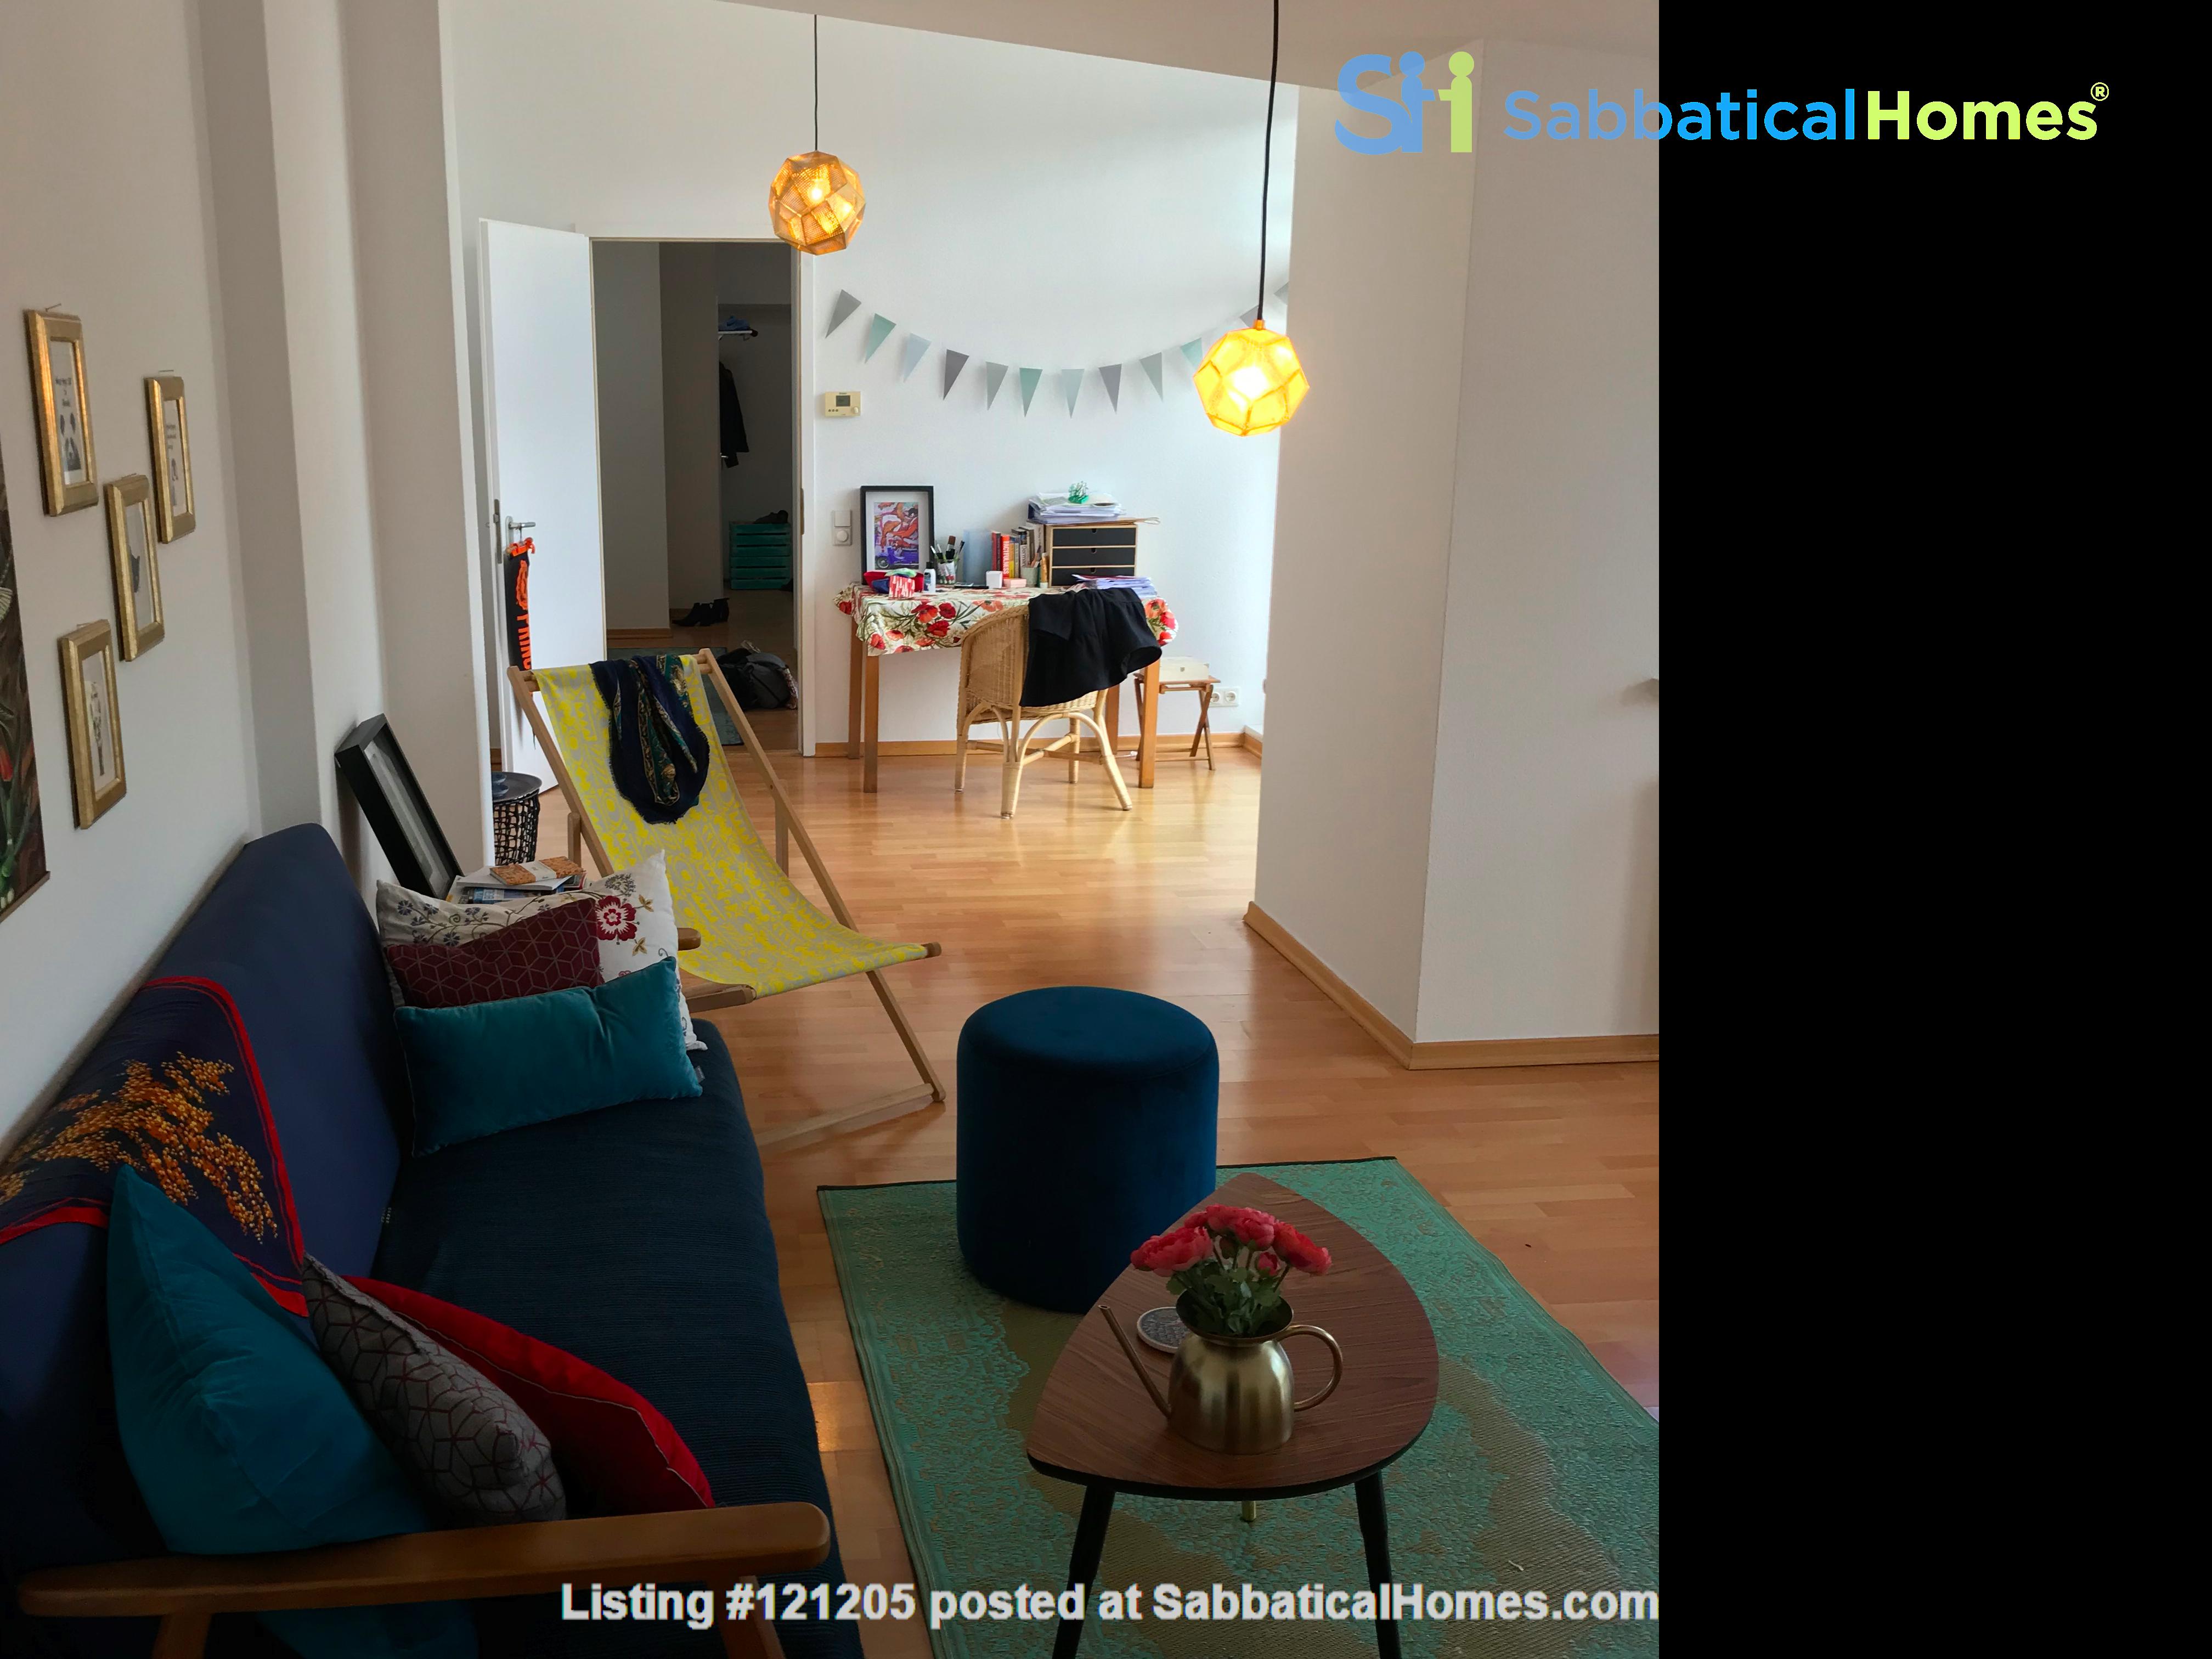 Luxury top-floor apt., 93qm & terrace in popular Bötzowviertel,  1-2 pers. Home Rental in Berlin, Berlin, Germany 9